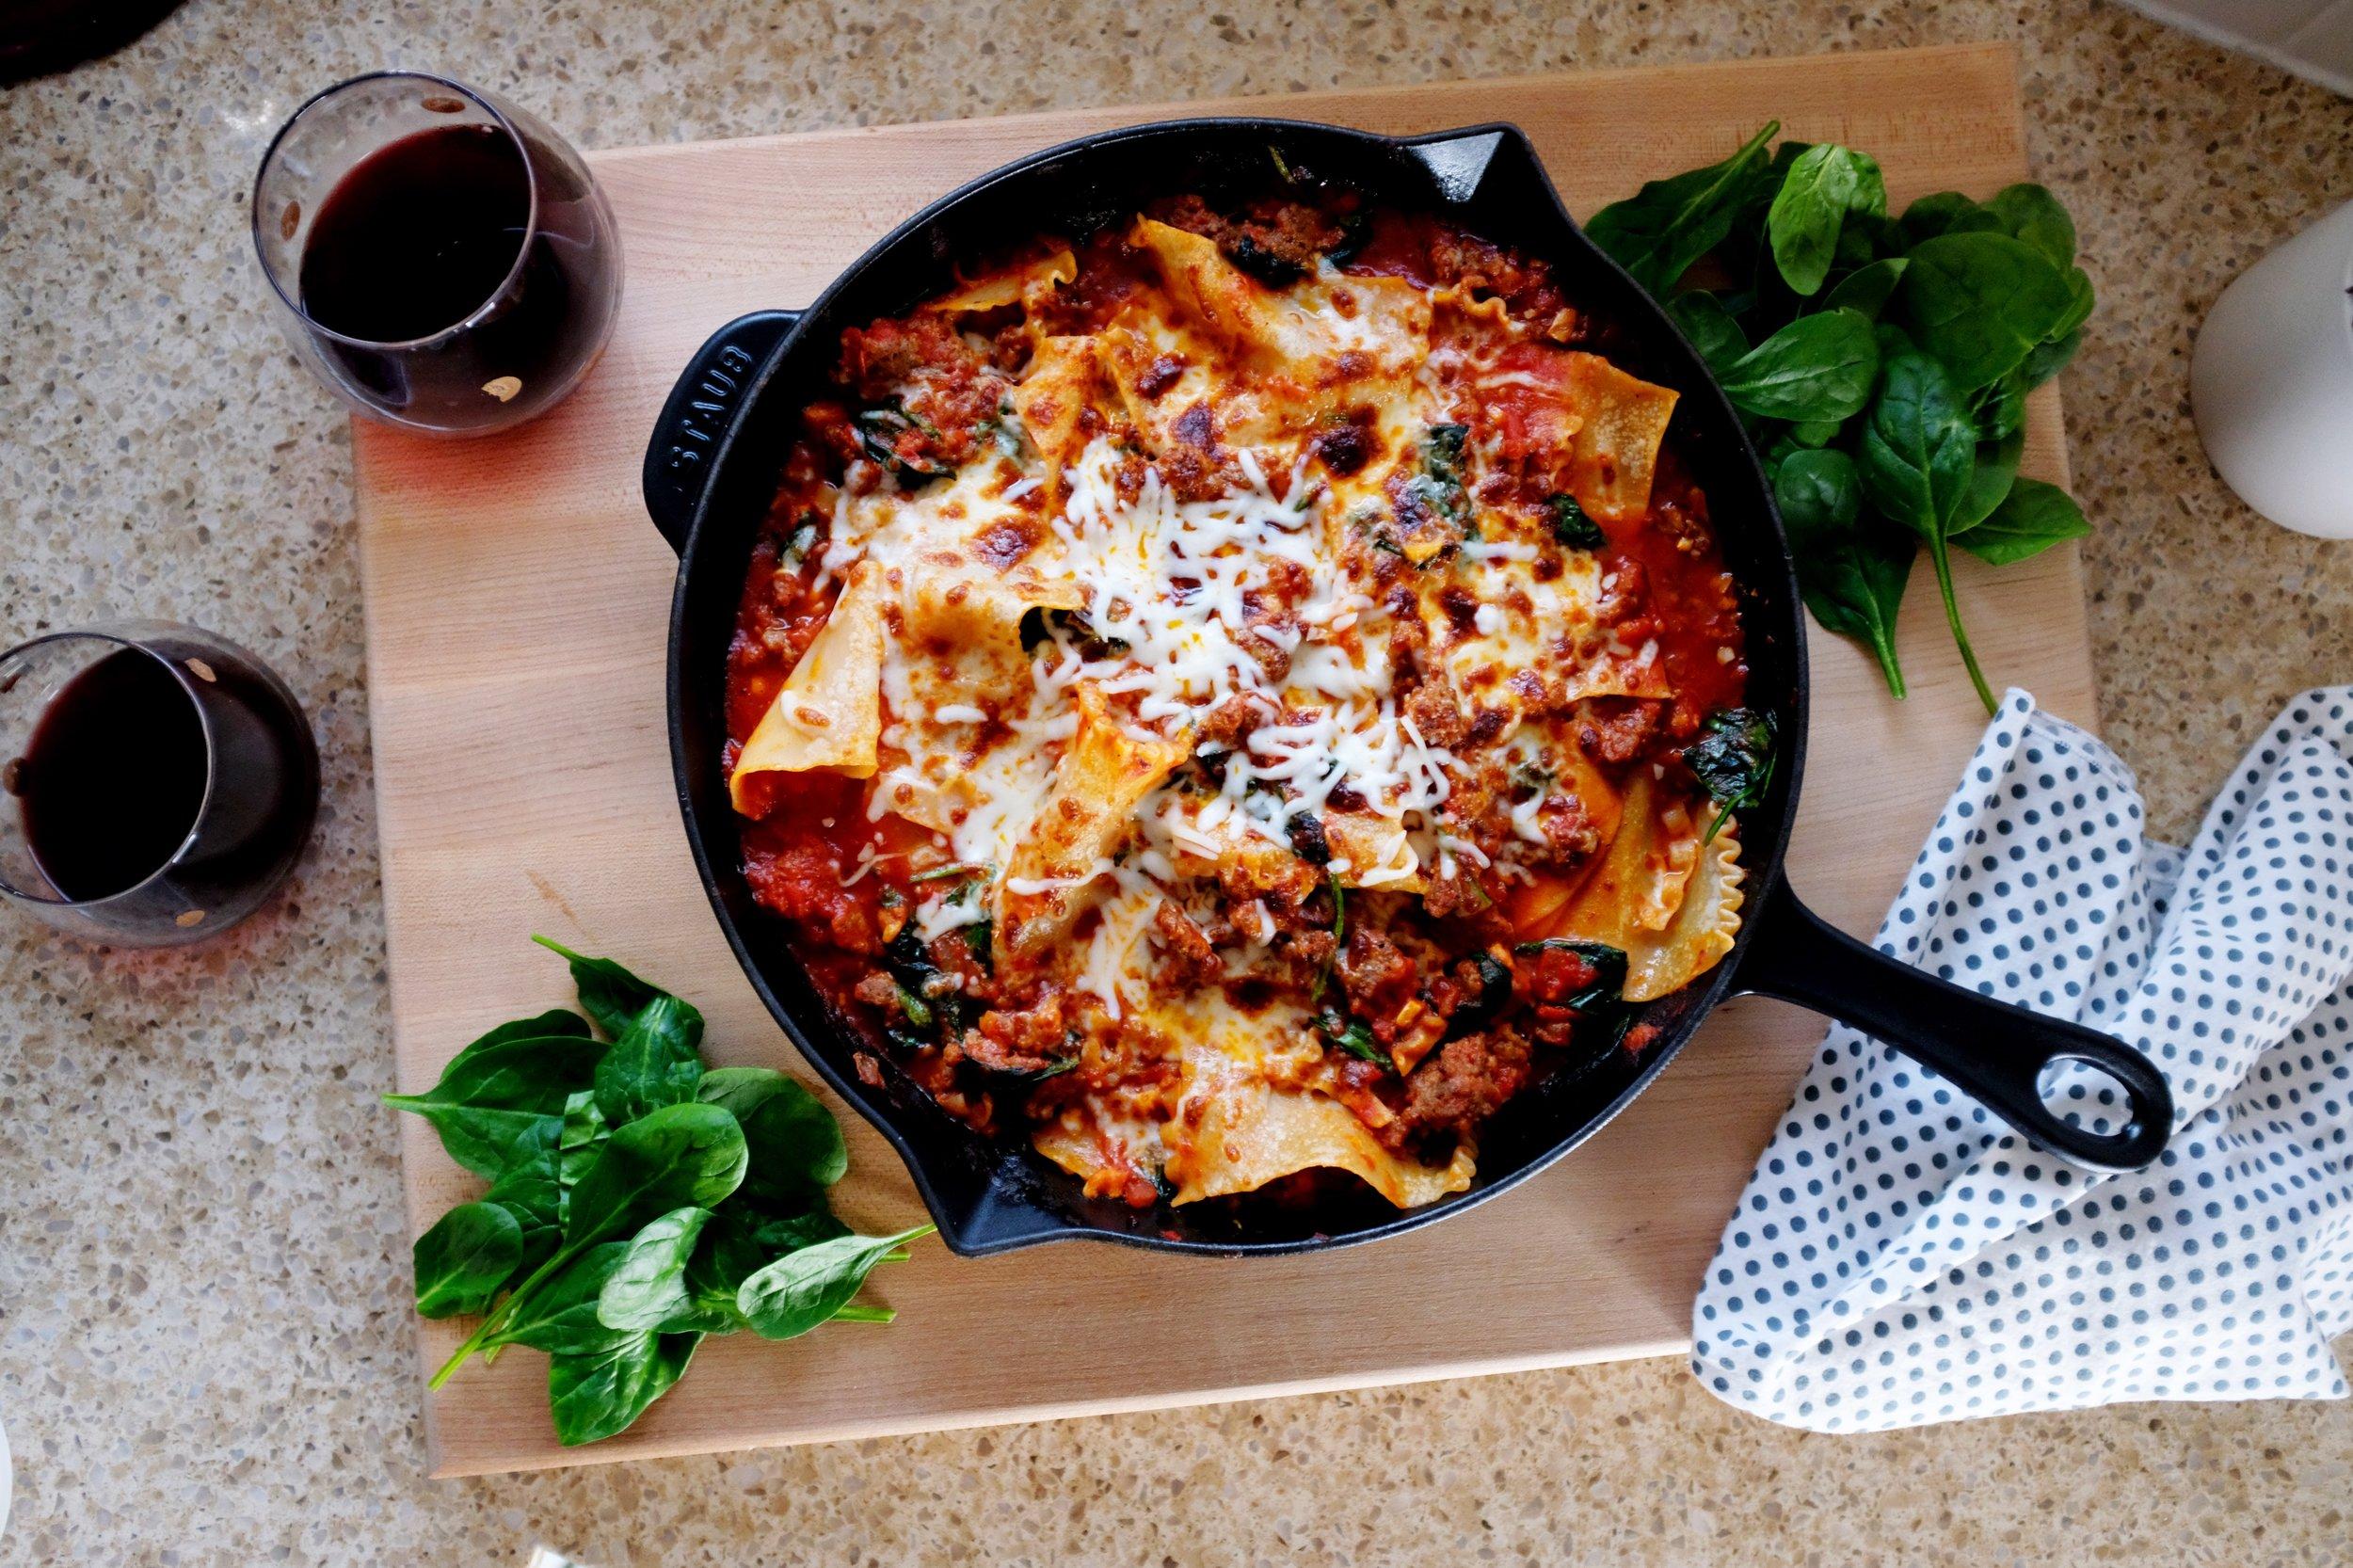 Easy Weeknight Lasagna Recipe - Gluten Free Option